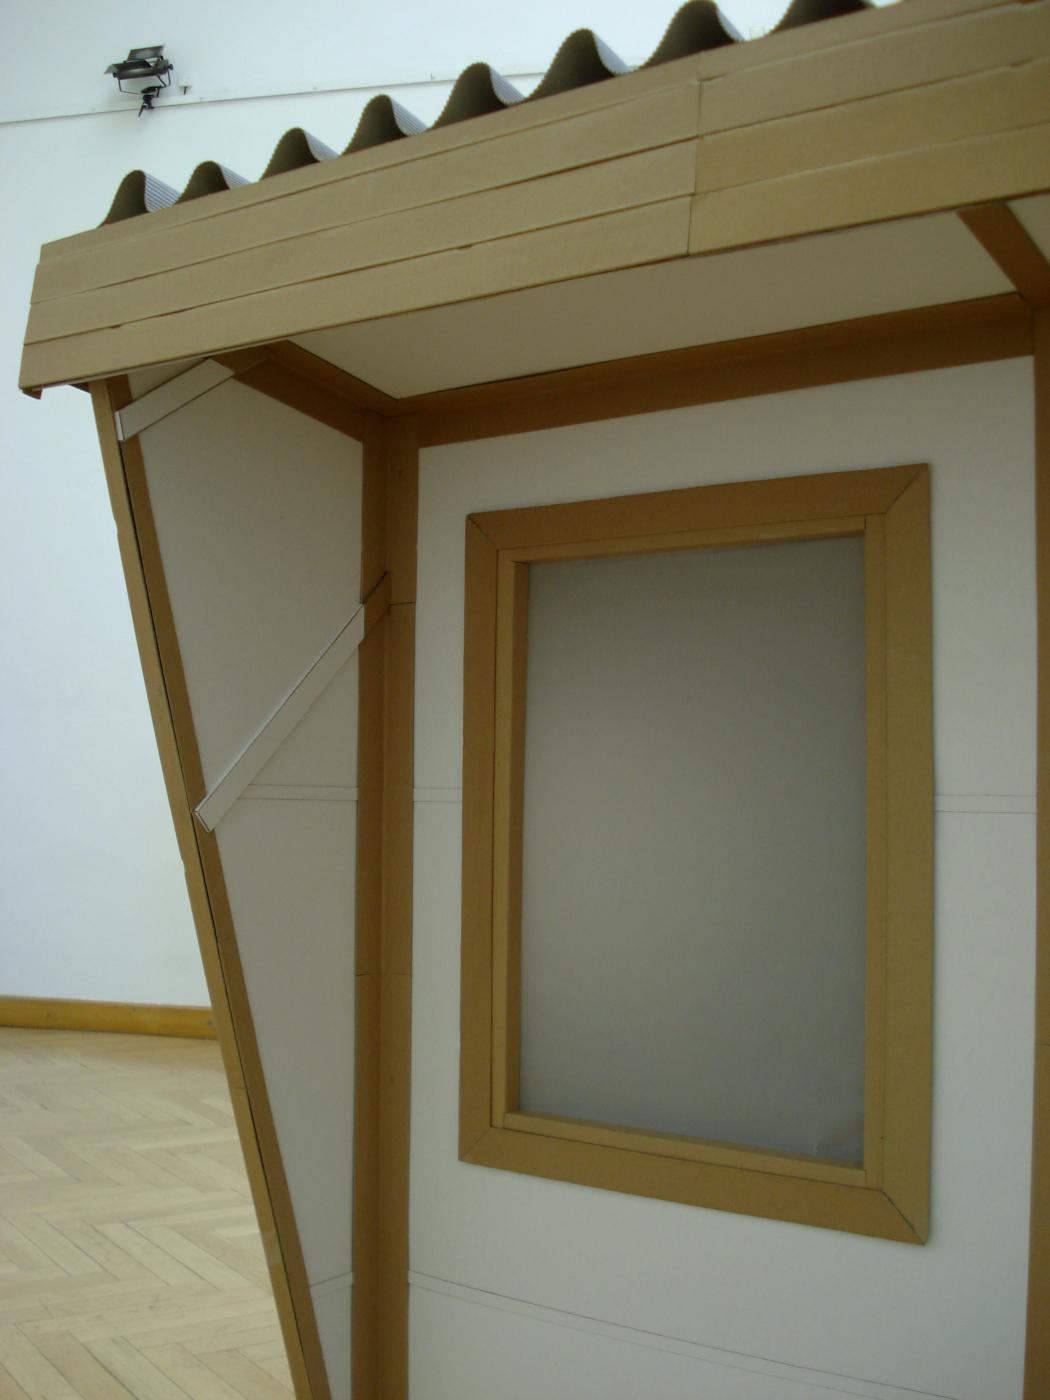 hut, fine art, cardboard, detail, fine art